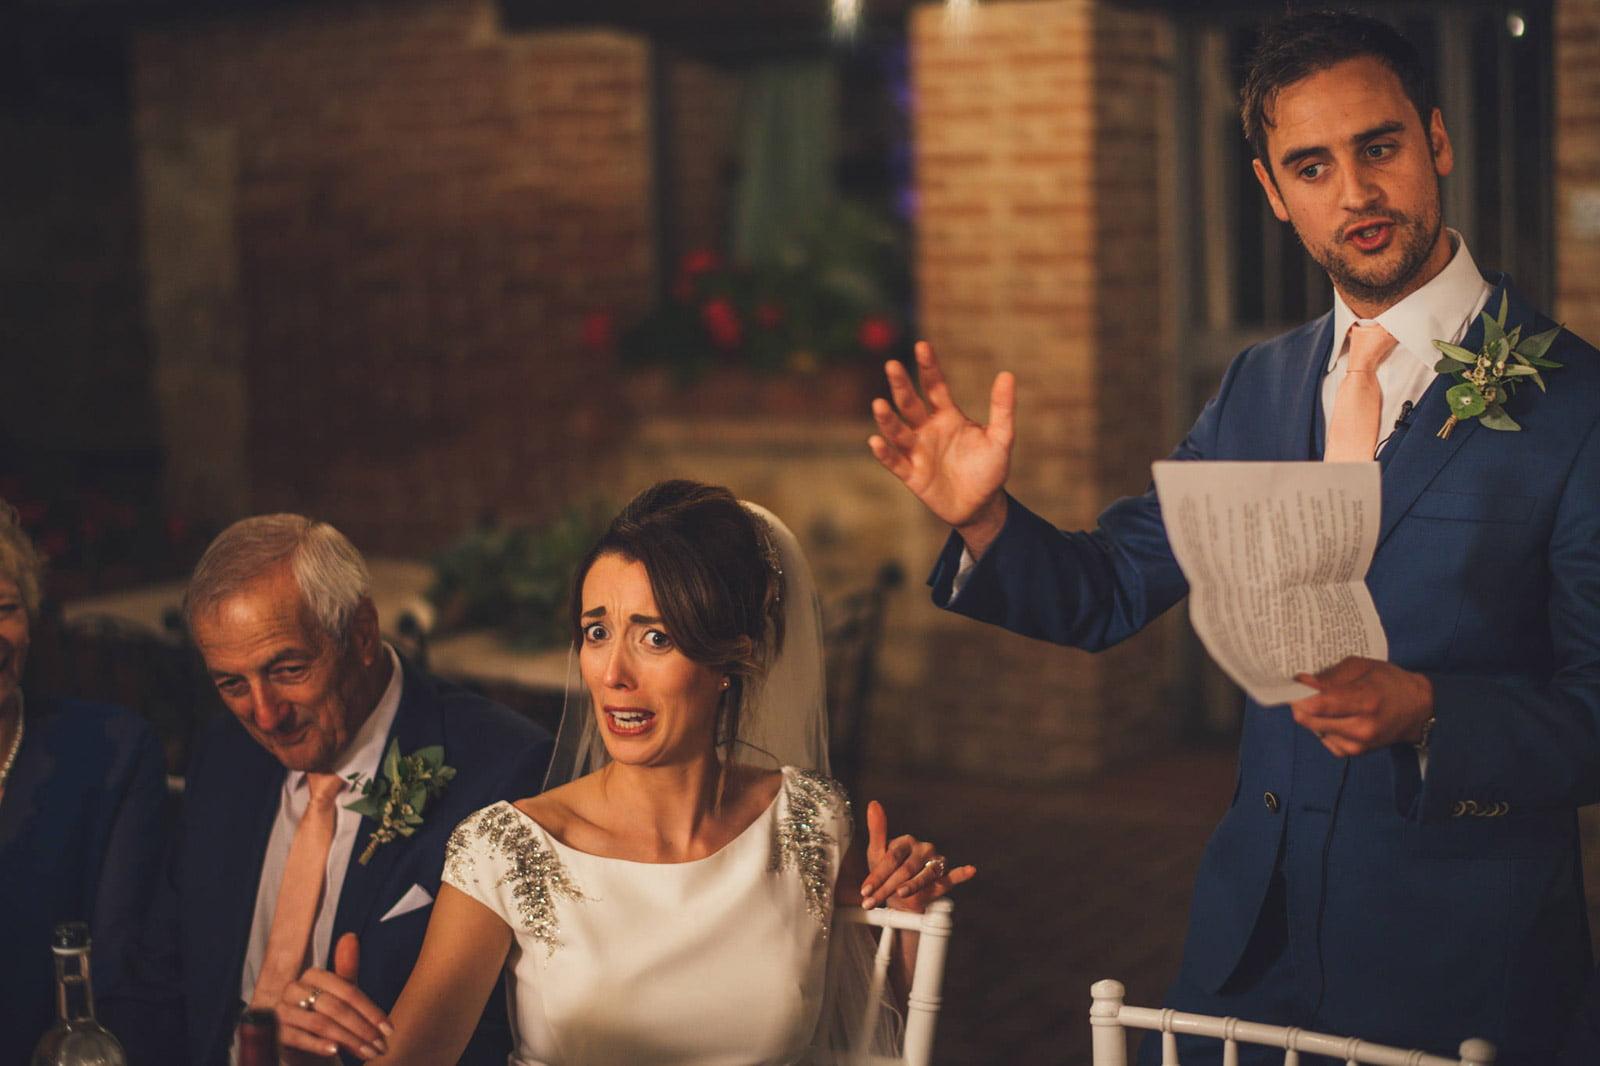 095-wedding-tuscany-san-galgano-federico-pannacci-photographer